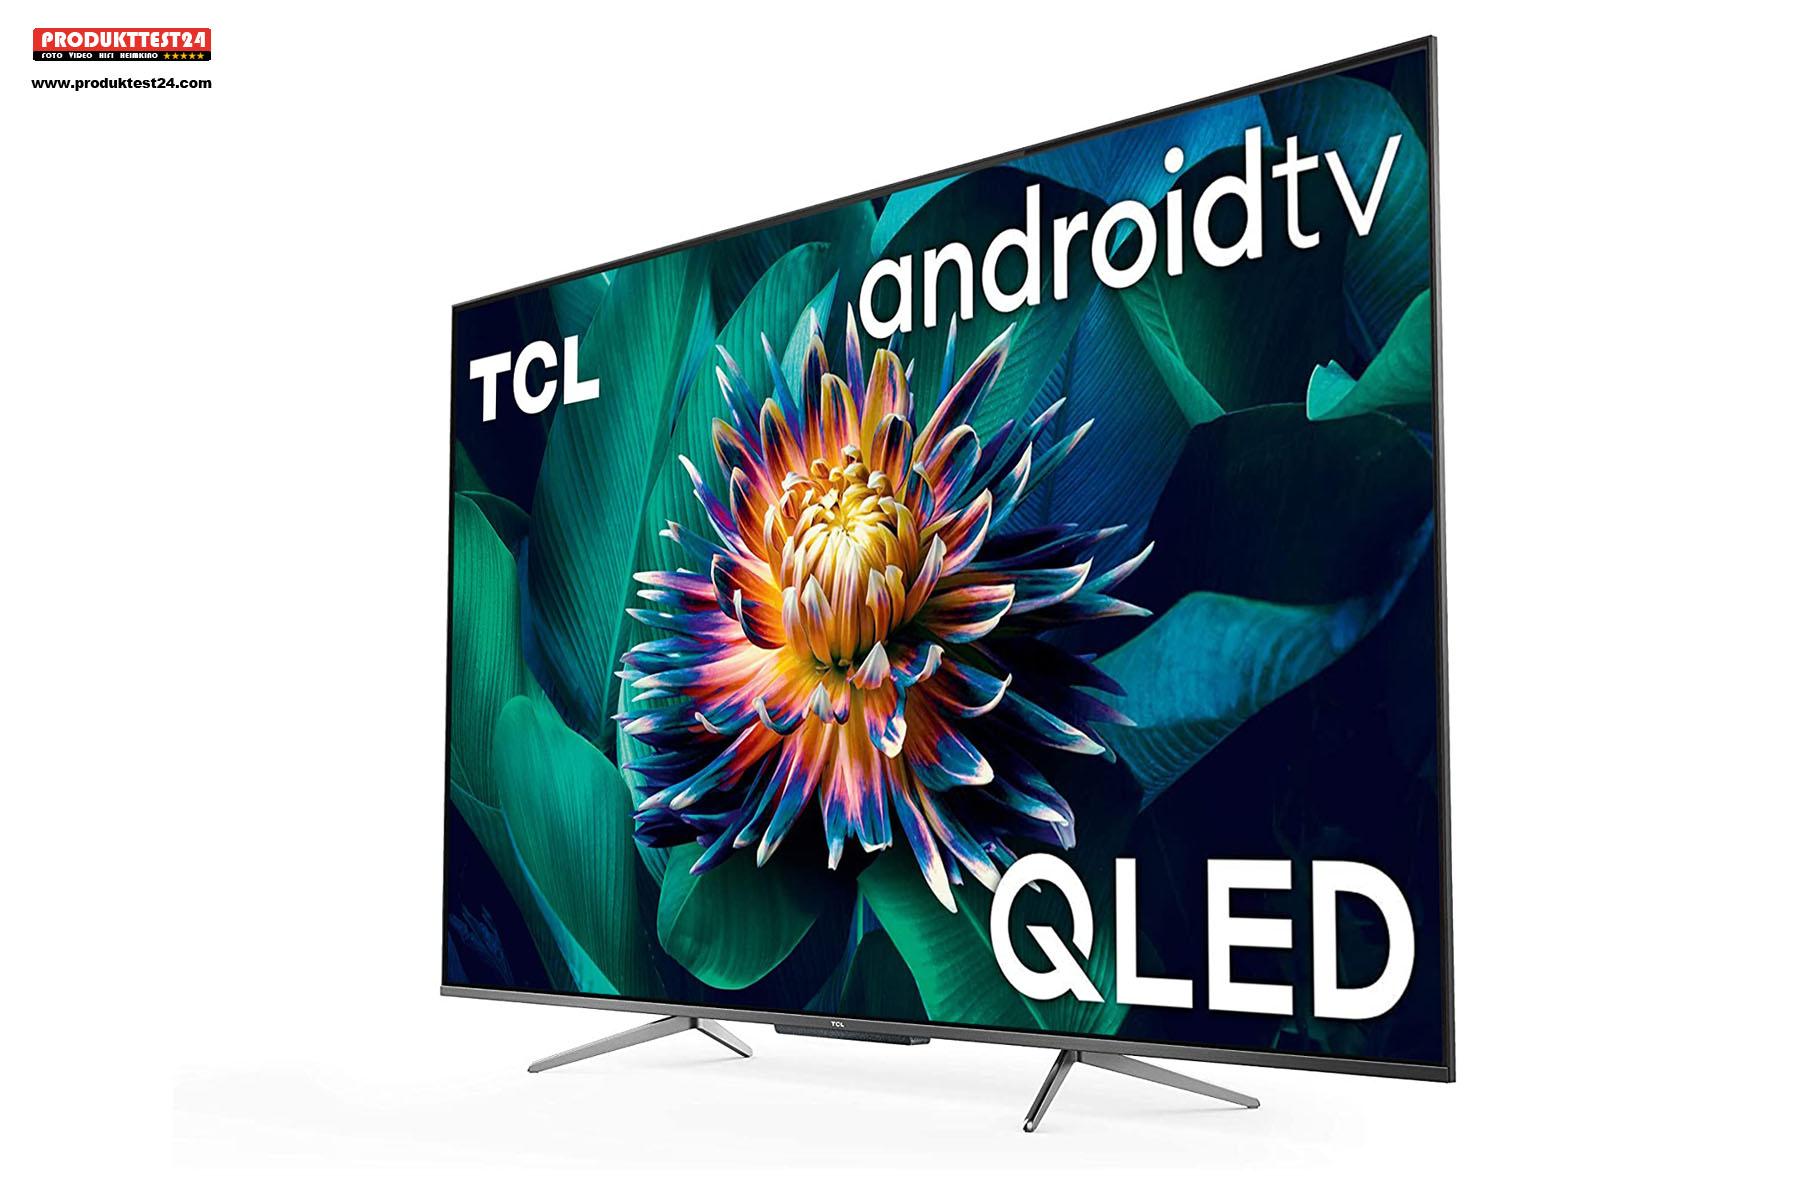 TCL 65C715 QLED 4K Fernseher